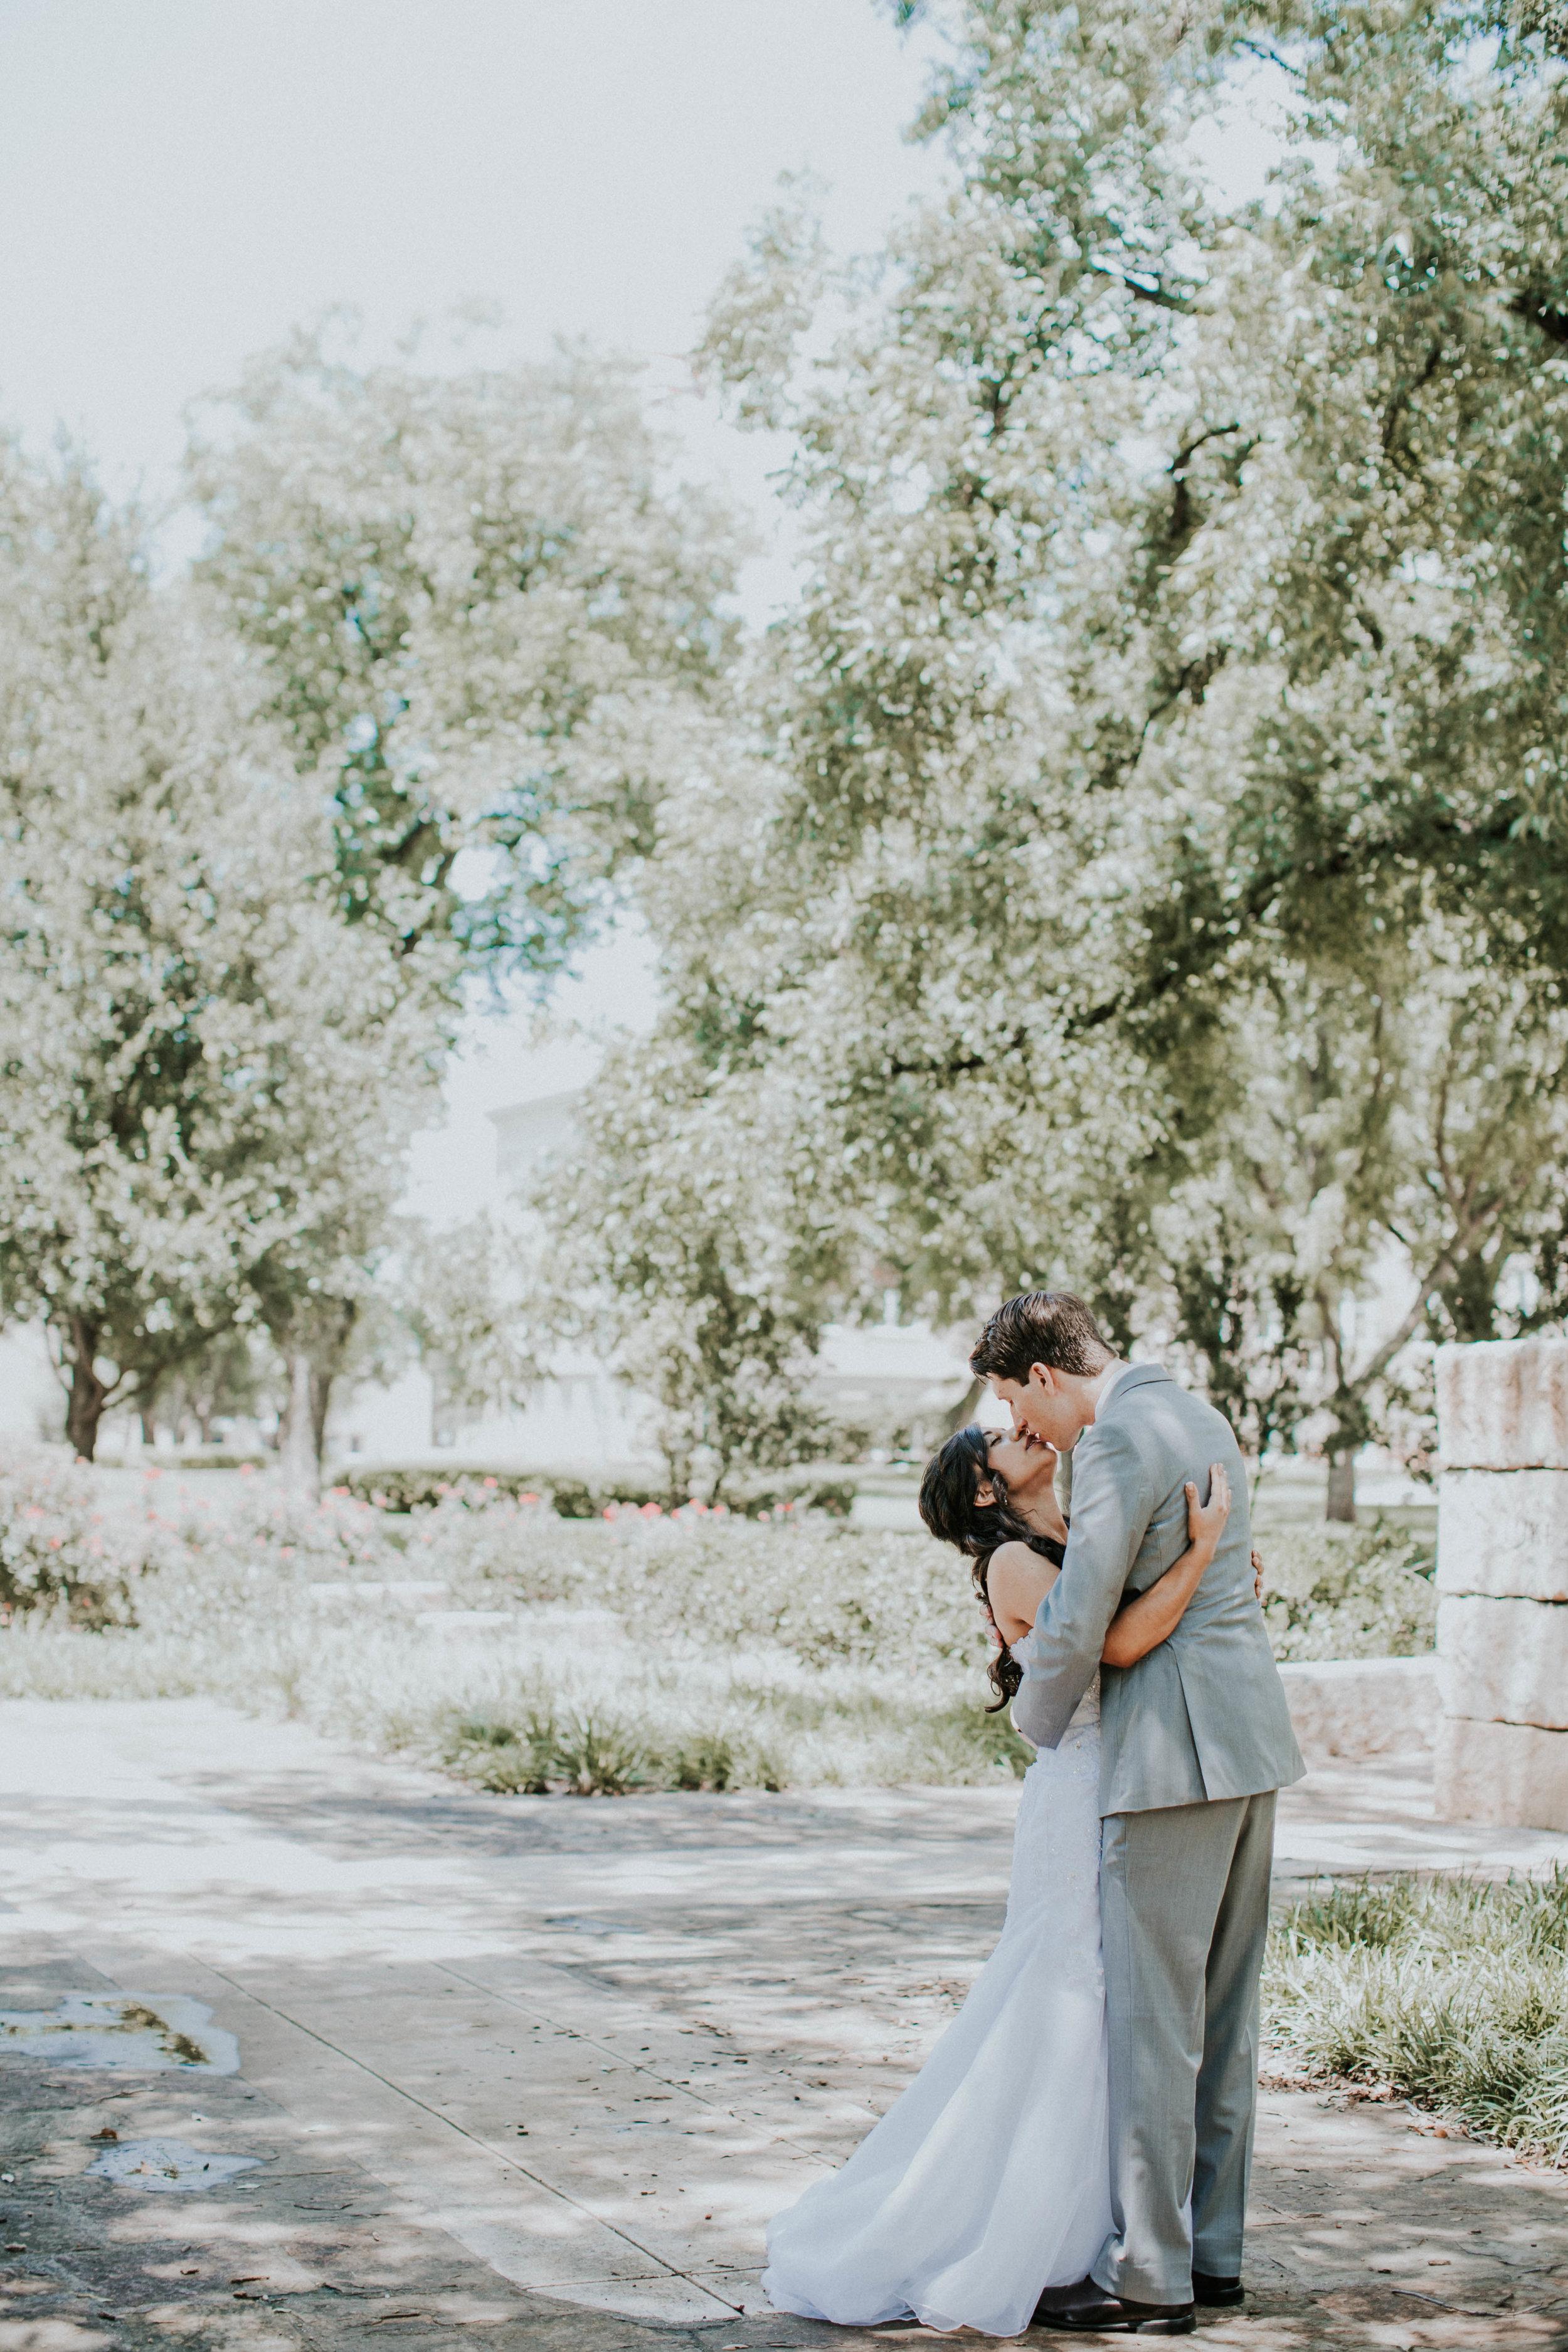 Abilene Engagment and Wedding Photographer-8733.jpg